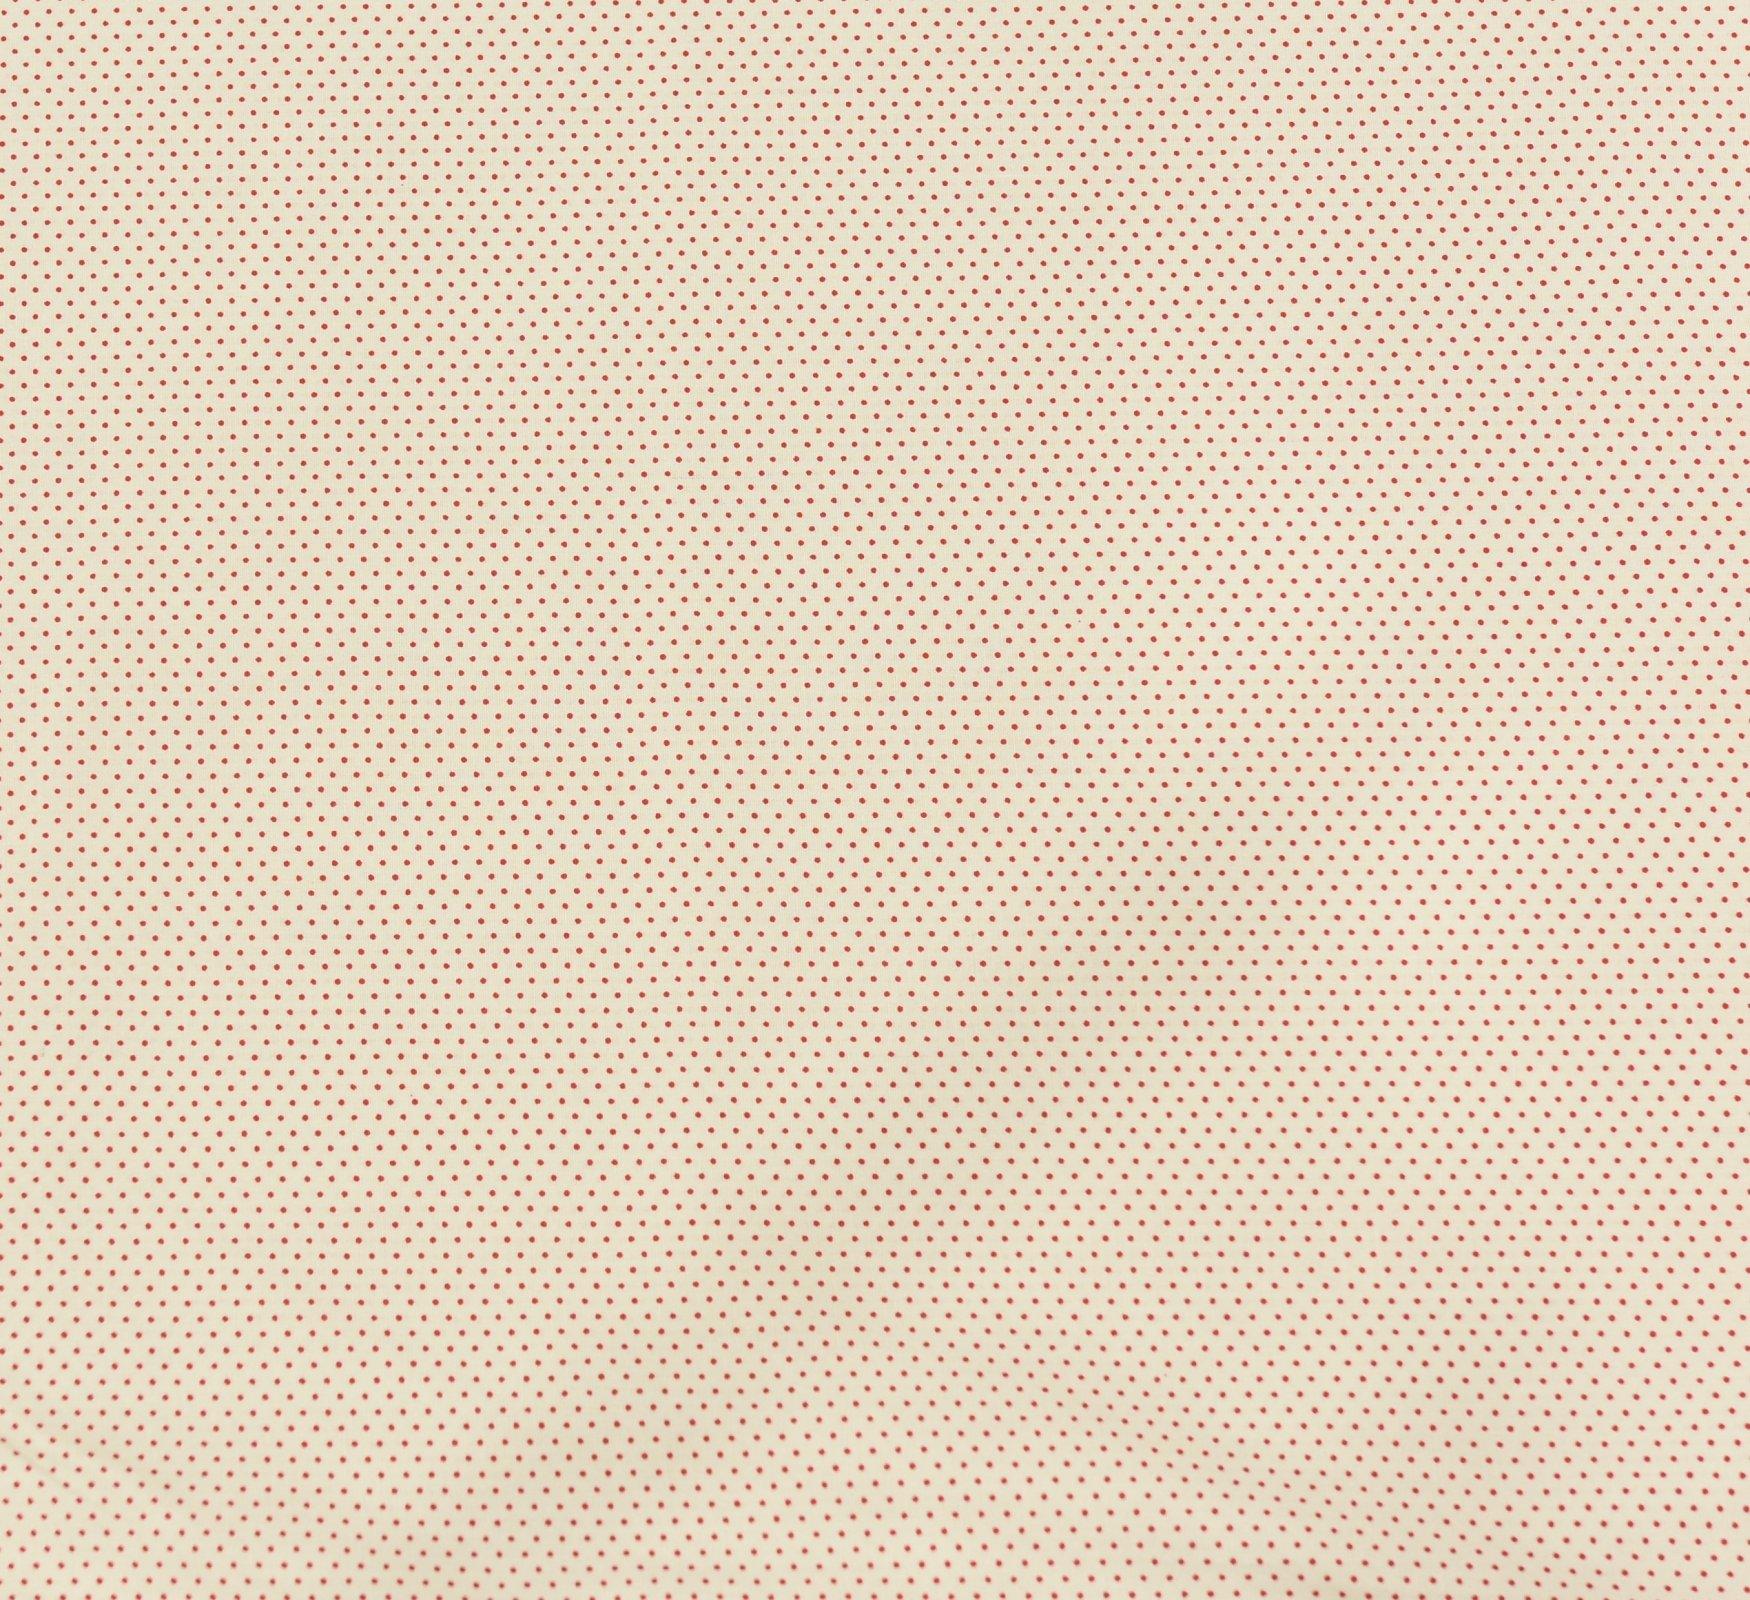 Sevenberry - Micro Spot - Red on Cream